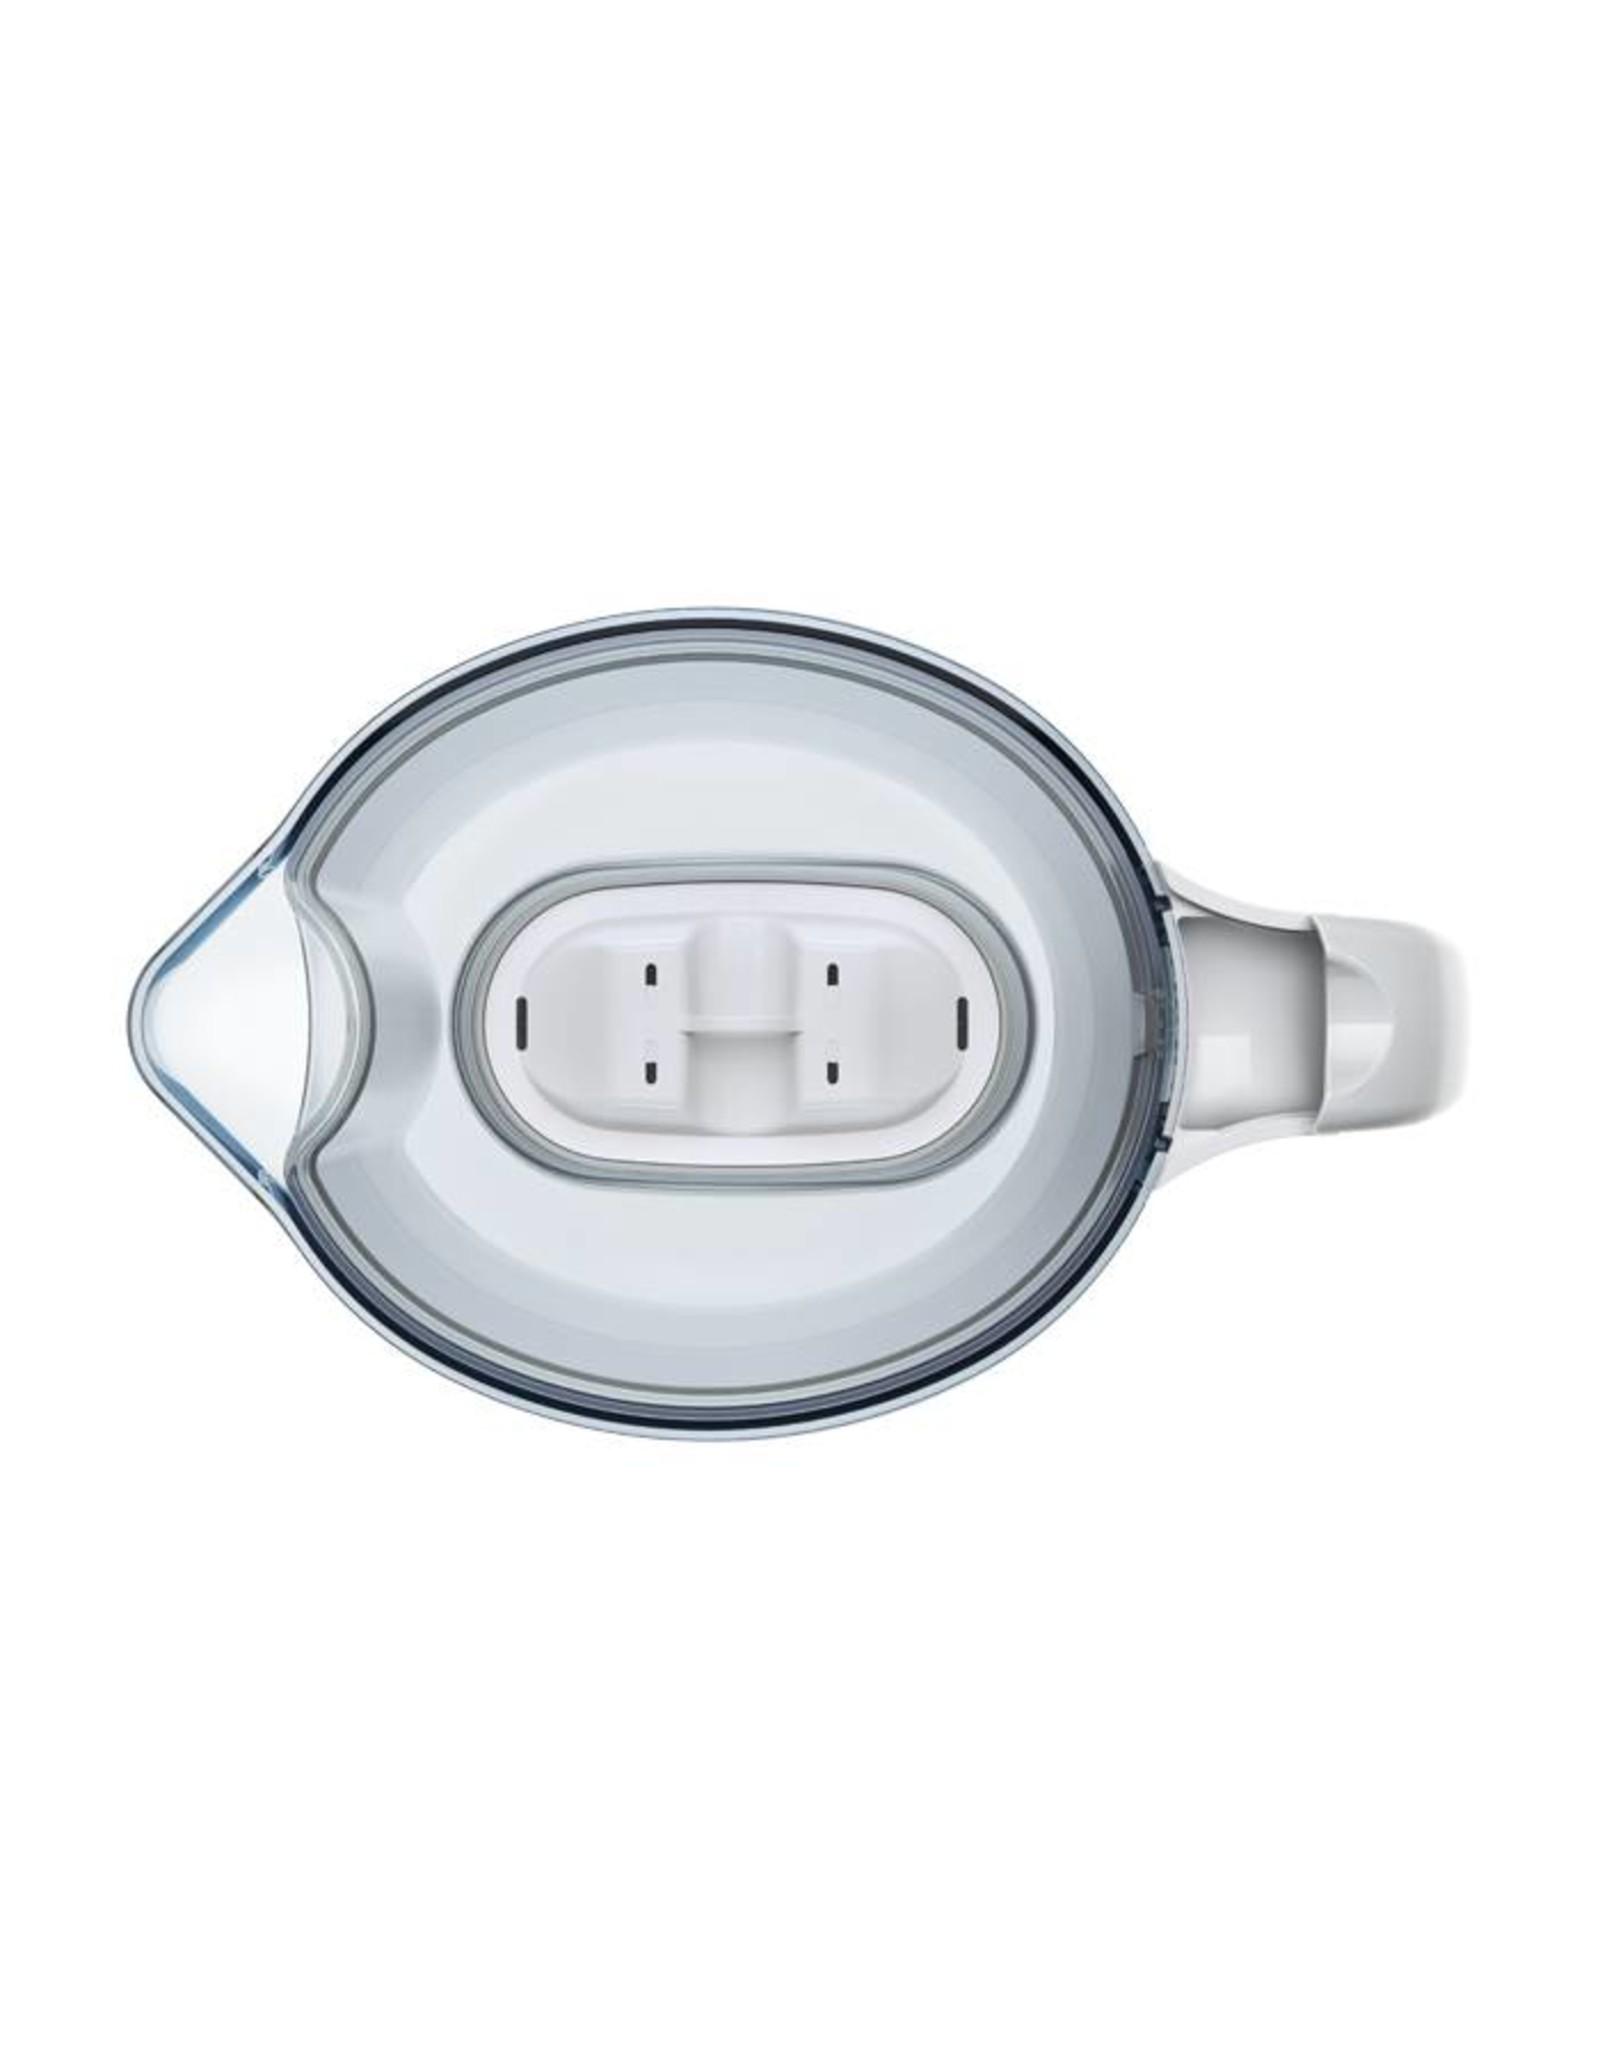 Flow One Filterkanne / 4.2 L  / 1-2 Personen Haushalt